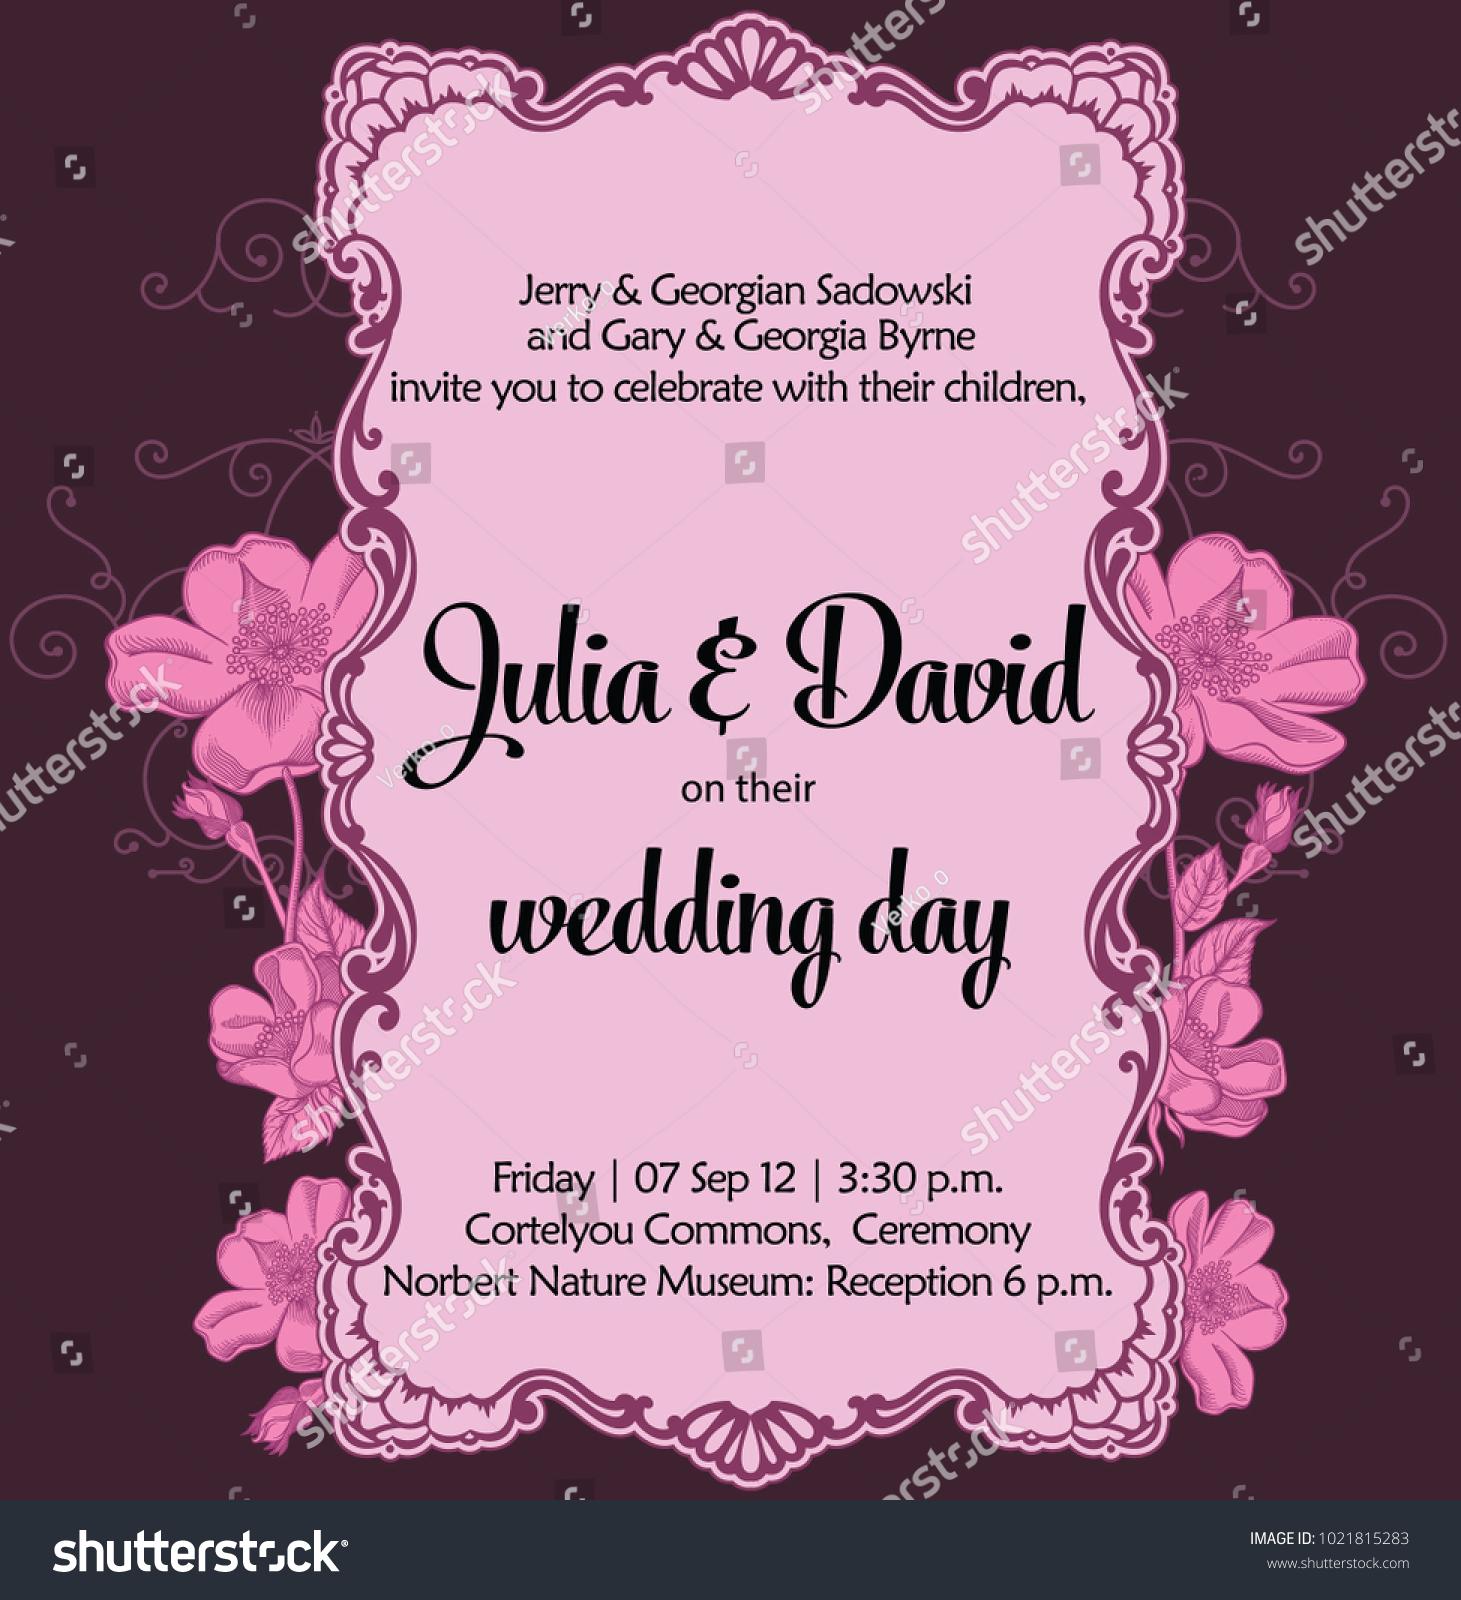 Marriage Romantic Invitation Decorative Floral Frame Wedding Stock ...